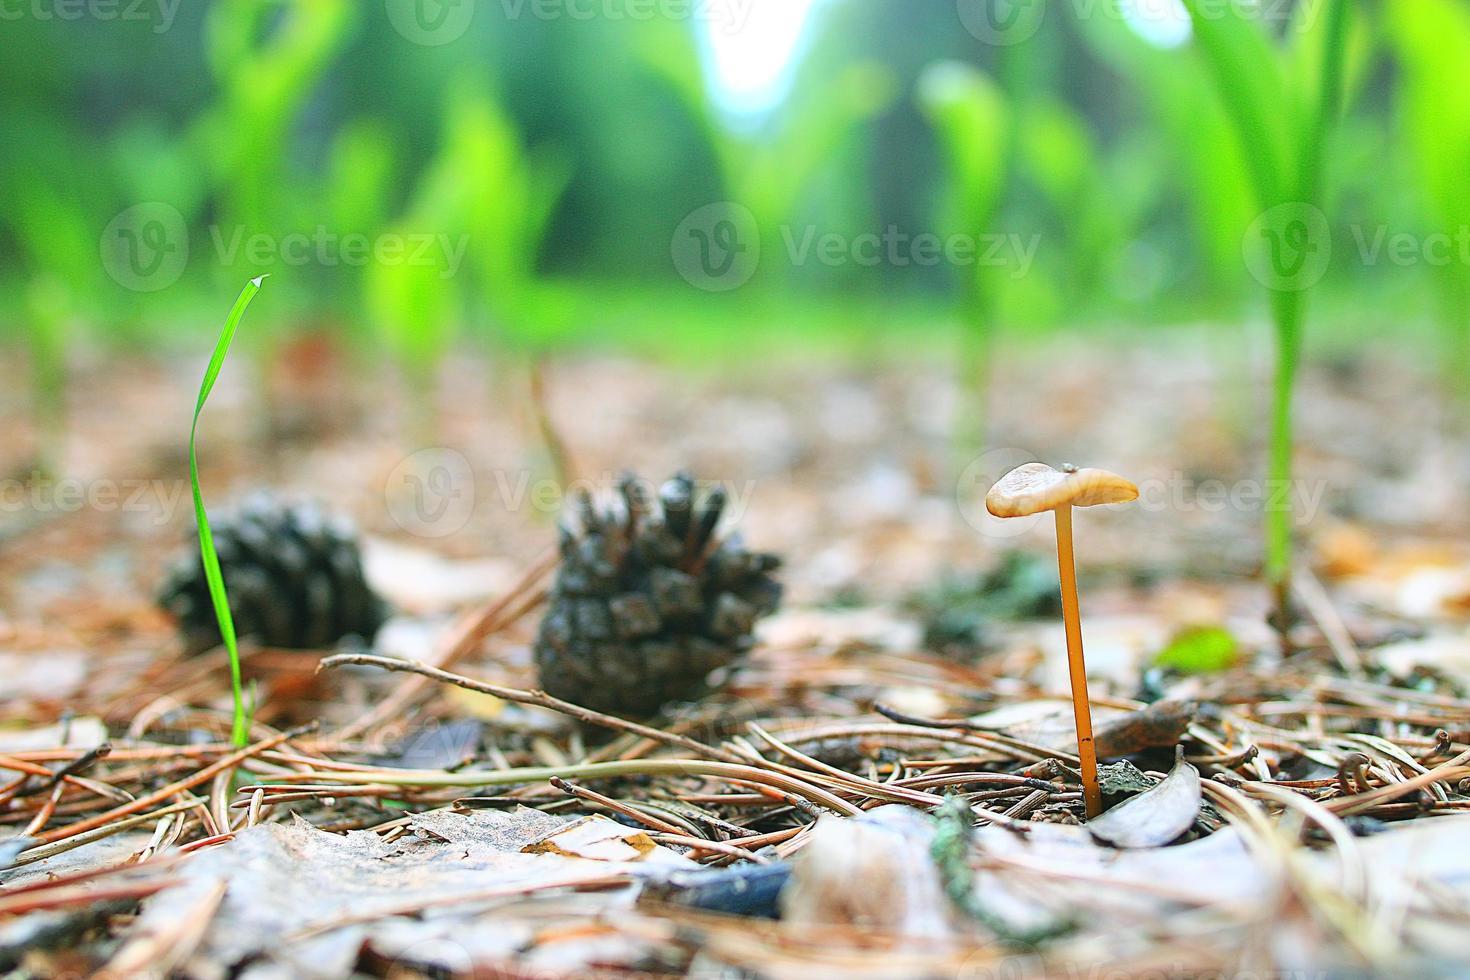 textur moss lav makro svamp foto